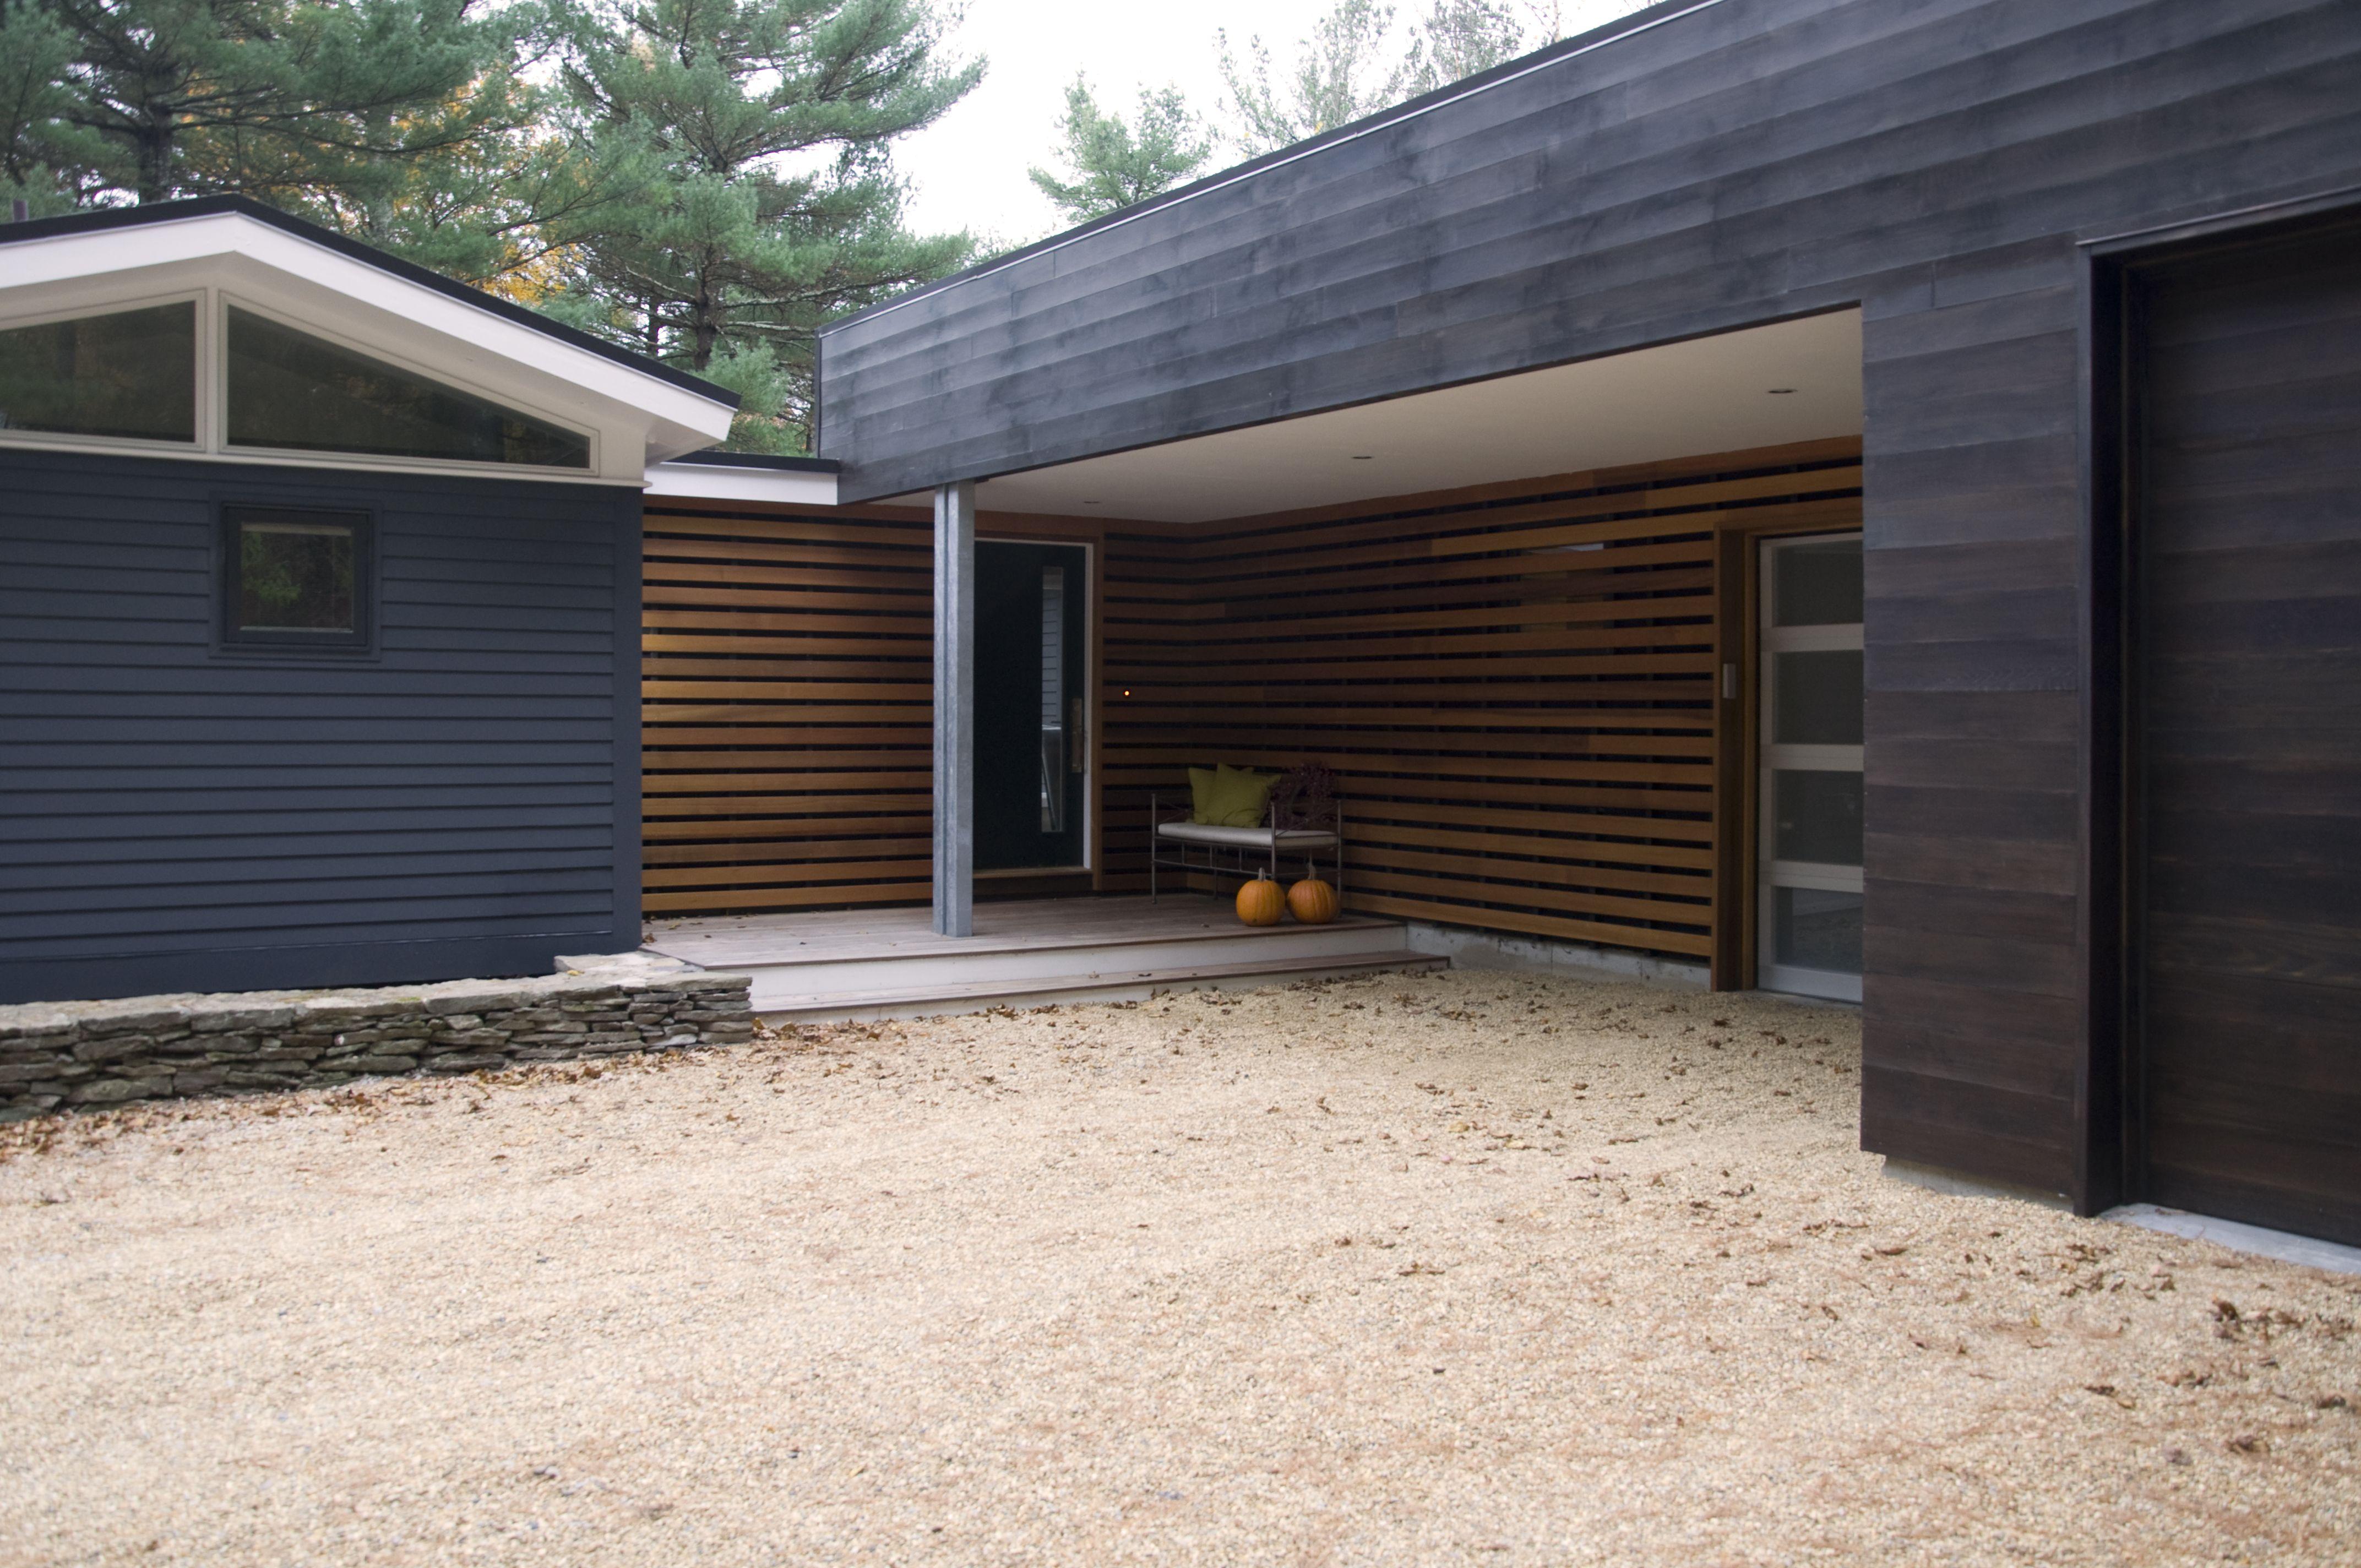 Best Midcentury Cedar Wood Siding Mid Century Modern House 400 x 300